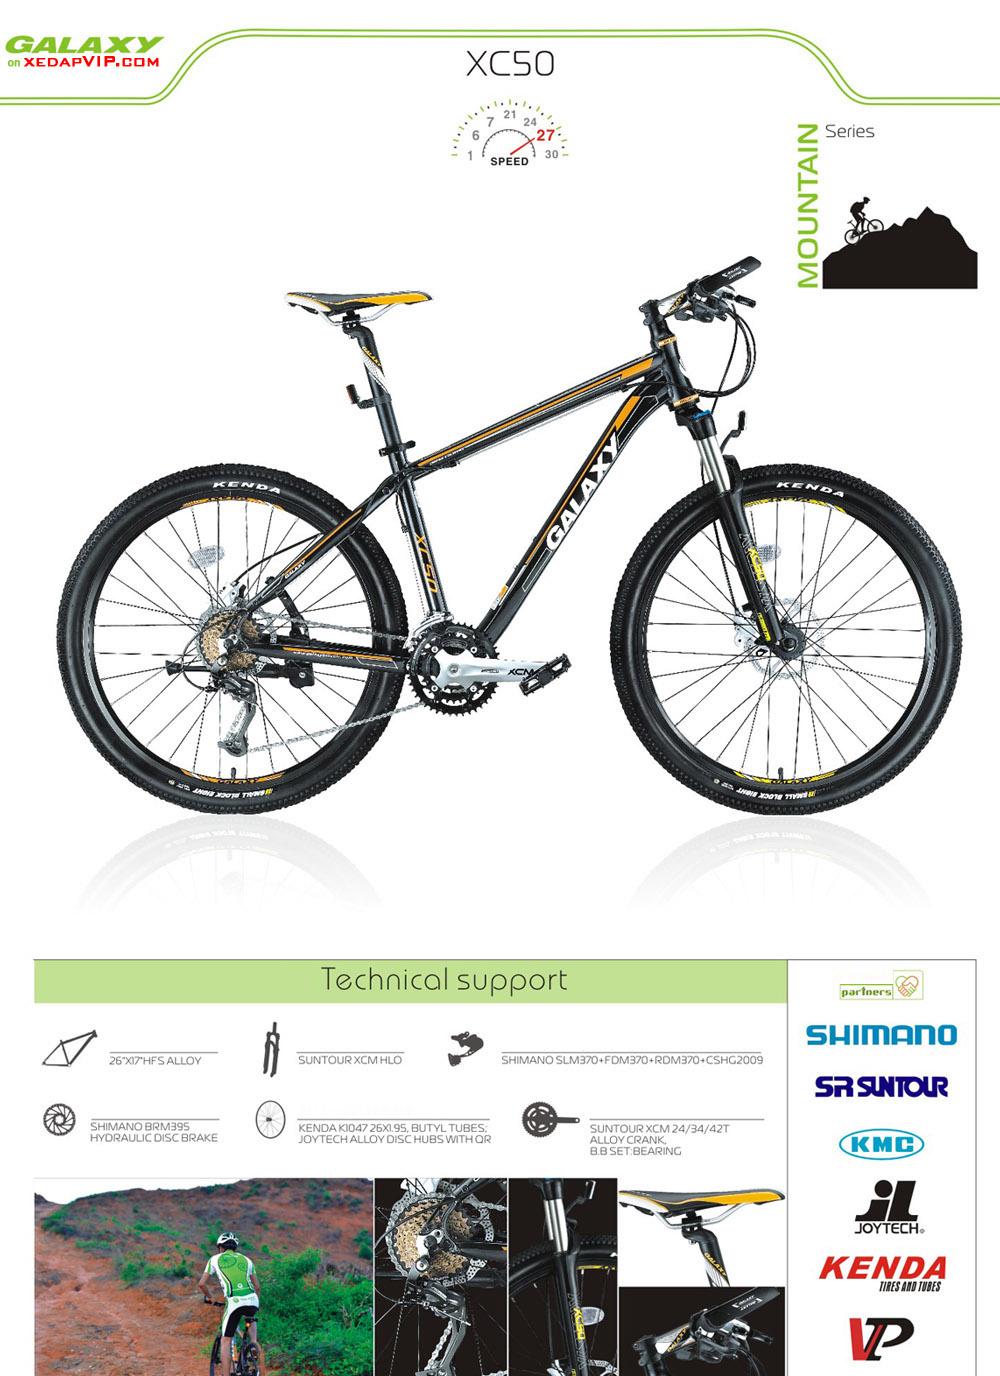 Xe dap the thao GALAXY XC50, xe dap the thao, xe dap trinx, xe đạp thể thao chính hãng, xe dap asama, xc50